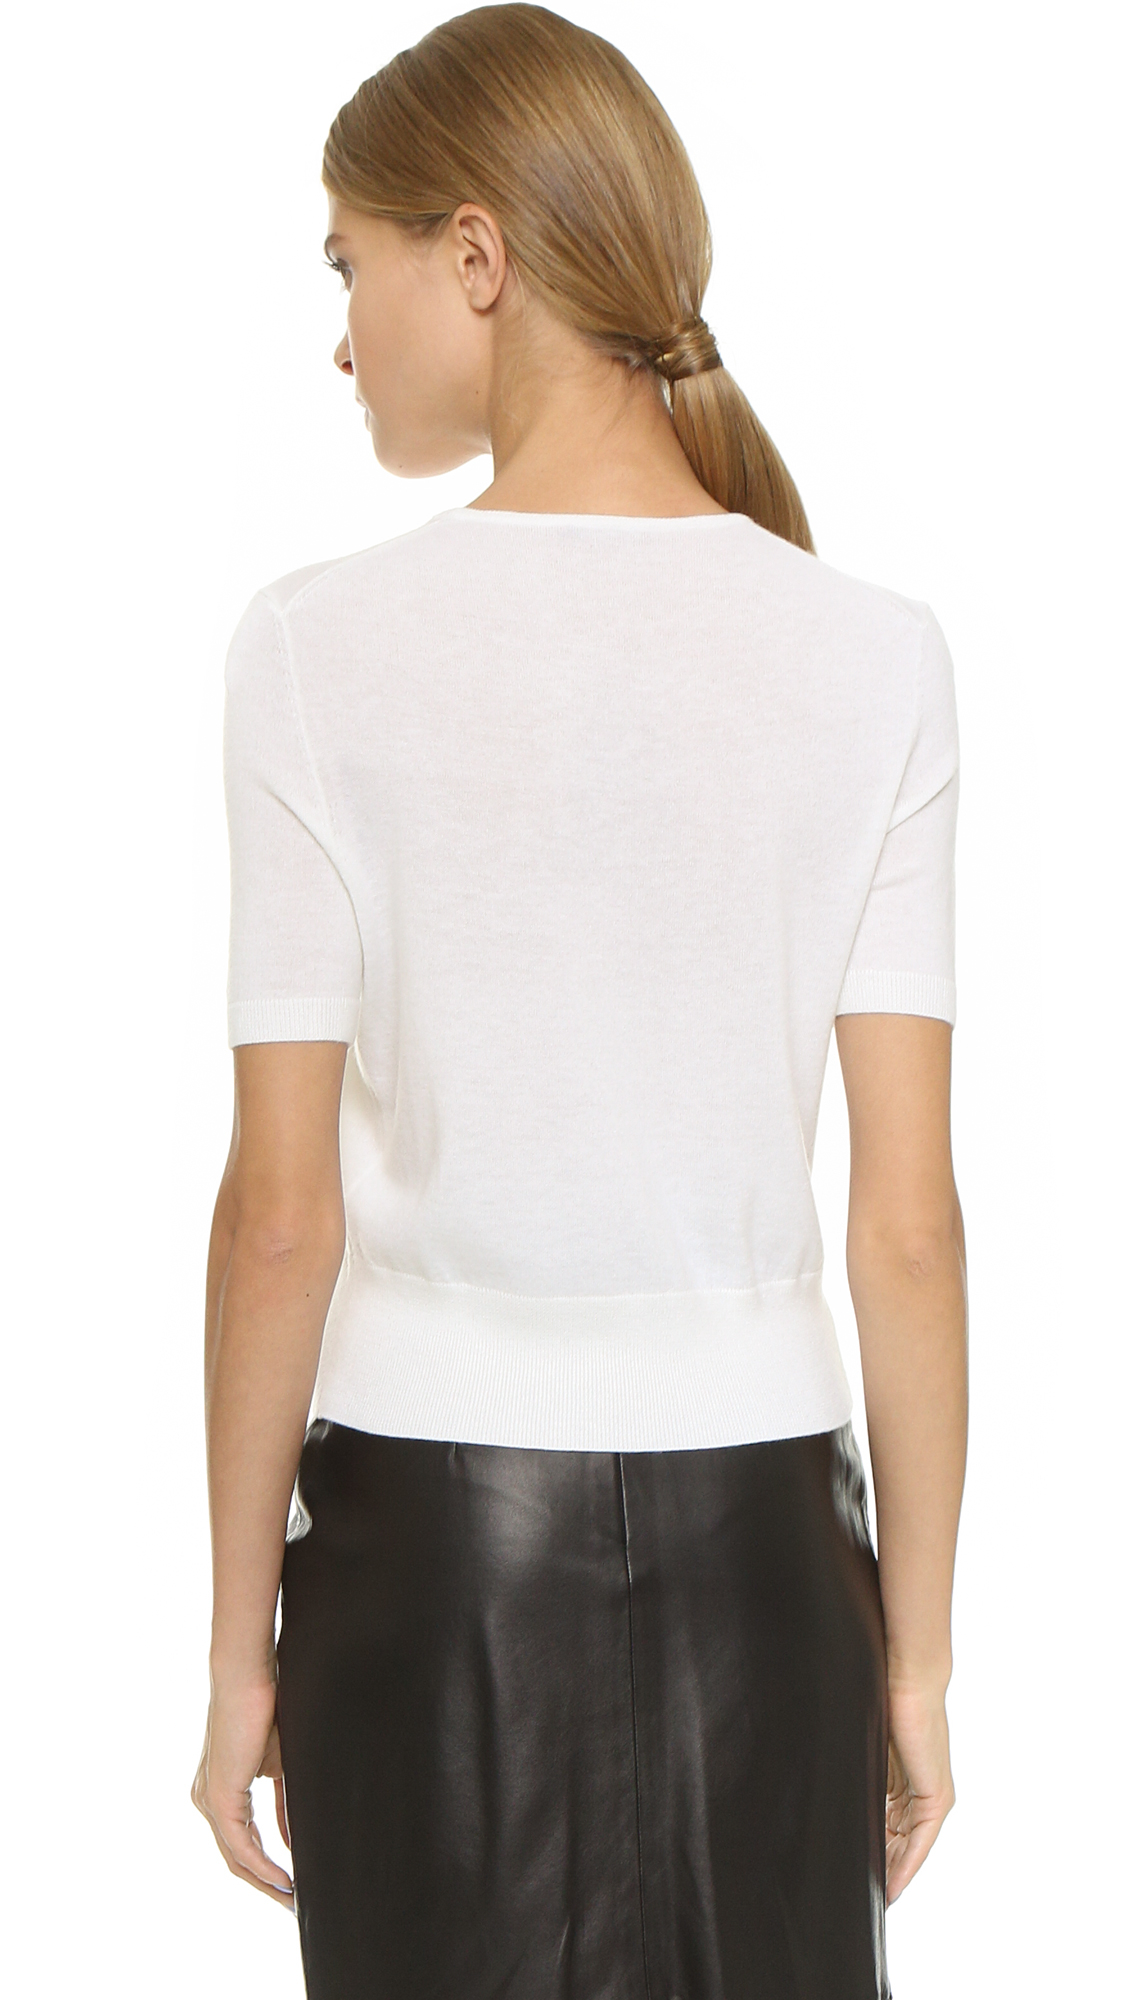 Tamara mellon Short Sleeve Cashmere Sweater - Cream in Natural | Lyst